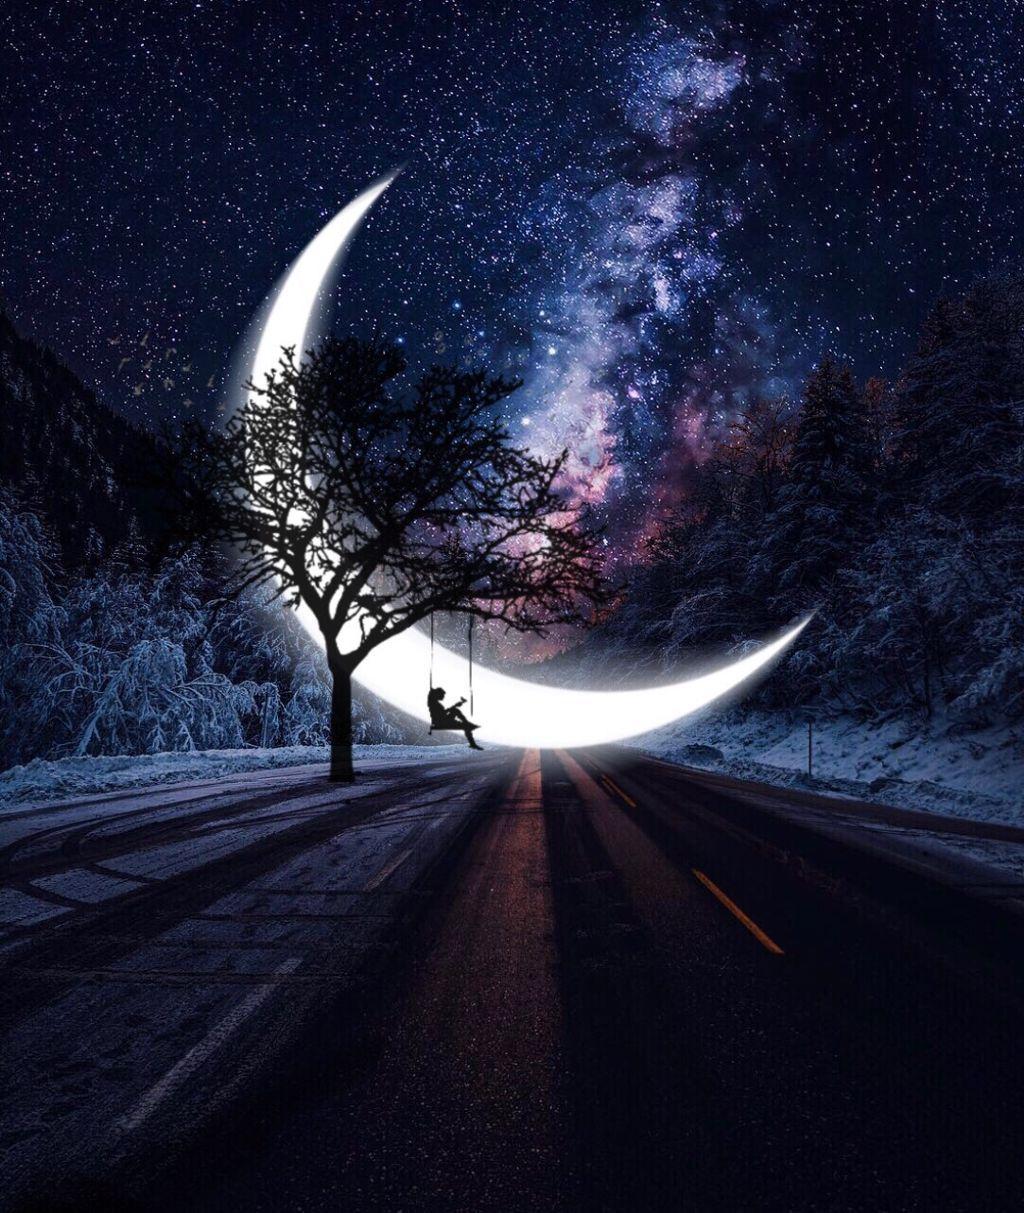 Freetoedit Myedit Edit Edited Surreal Moon Landscape Moonlight Photography Night Sky Wallpaper Galaxy Wallpaper